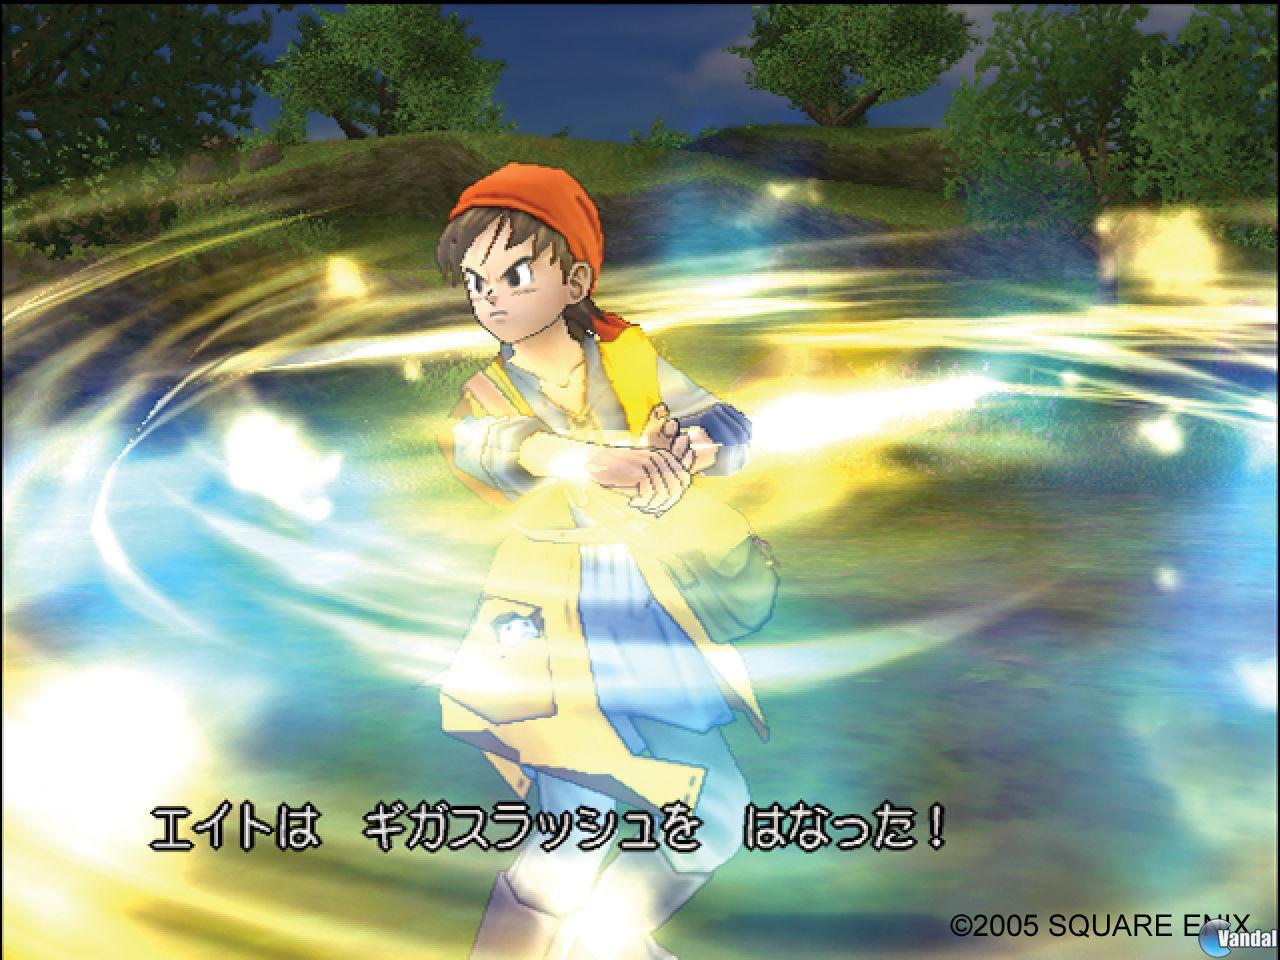 E3: Imágenes de Dragon Quest VIII: Journey of the Cursed King